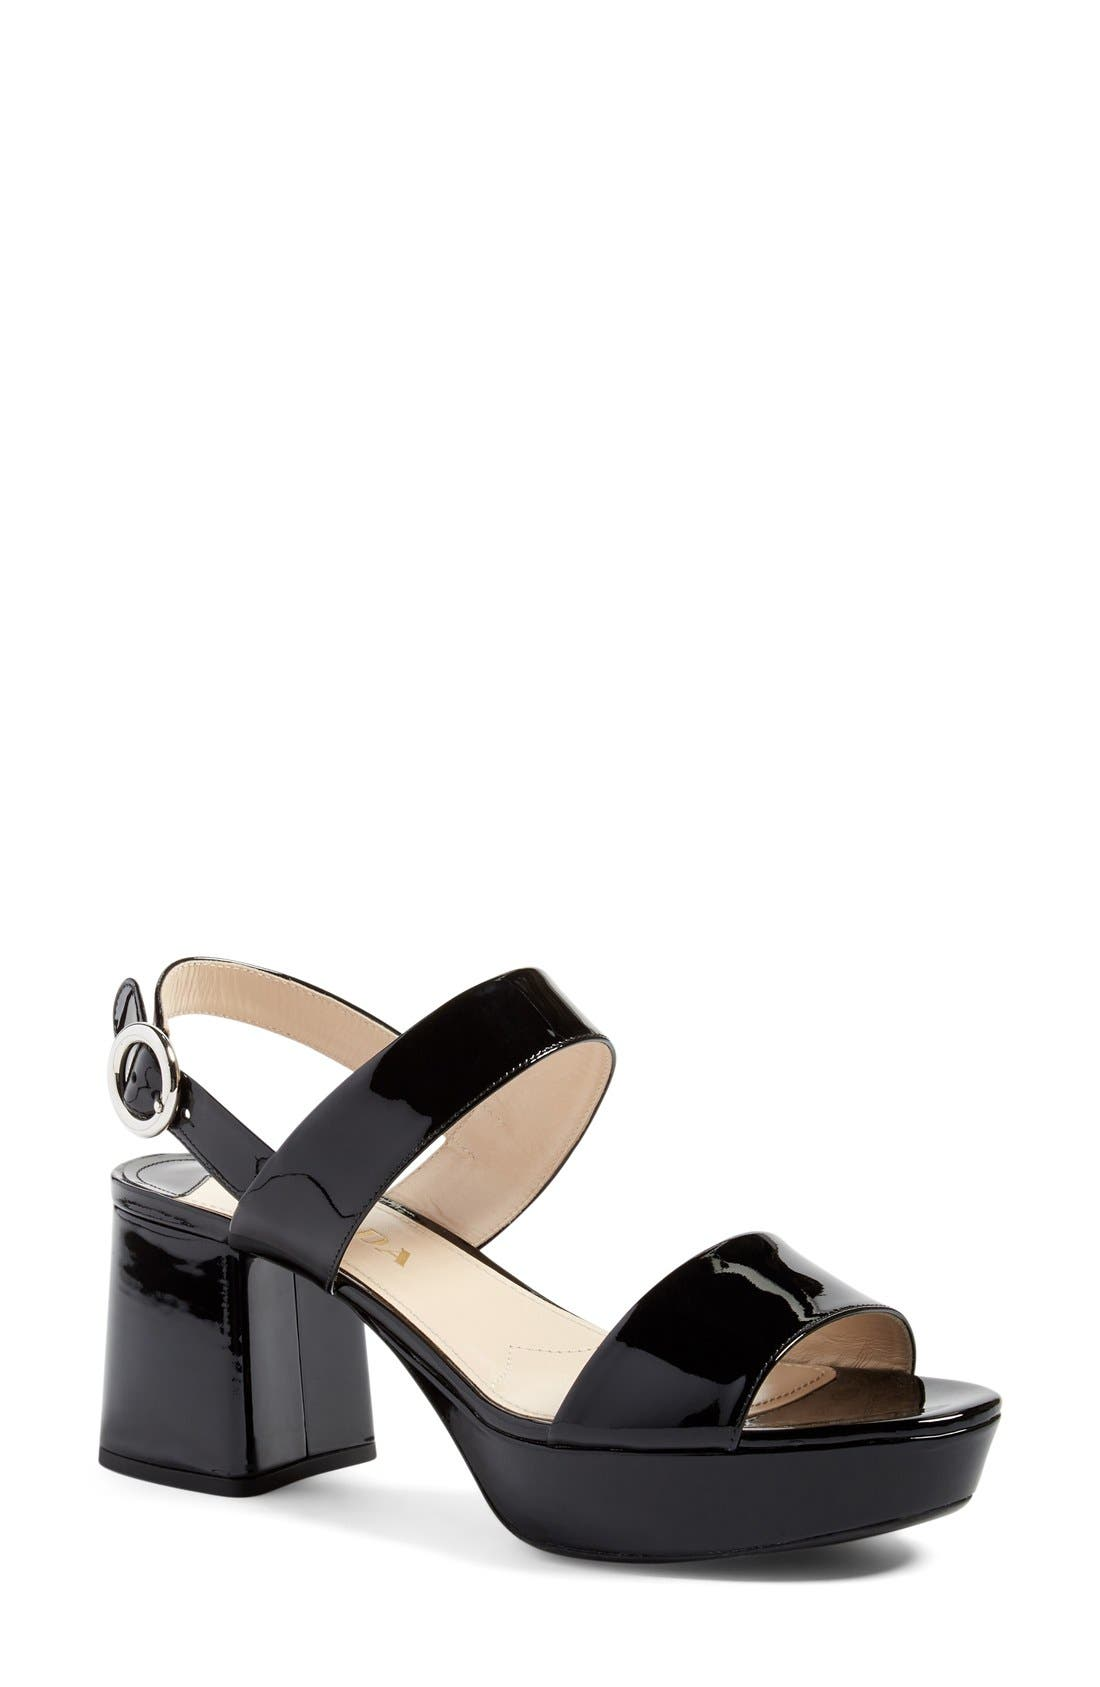 Alternate Image 1 Selected - Prada Slingback Platform Sandal (Women)